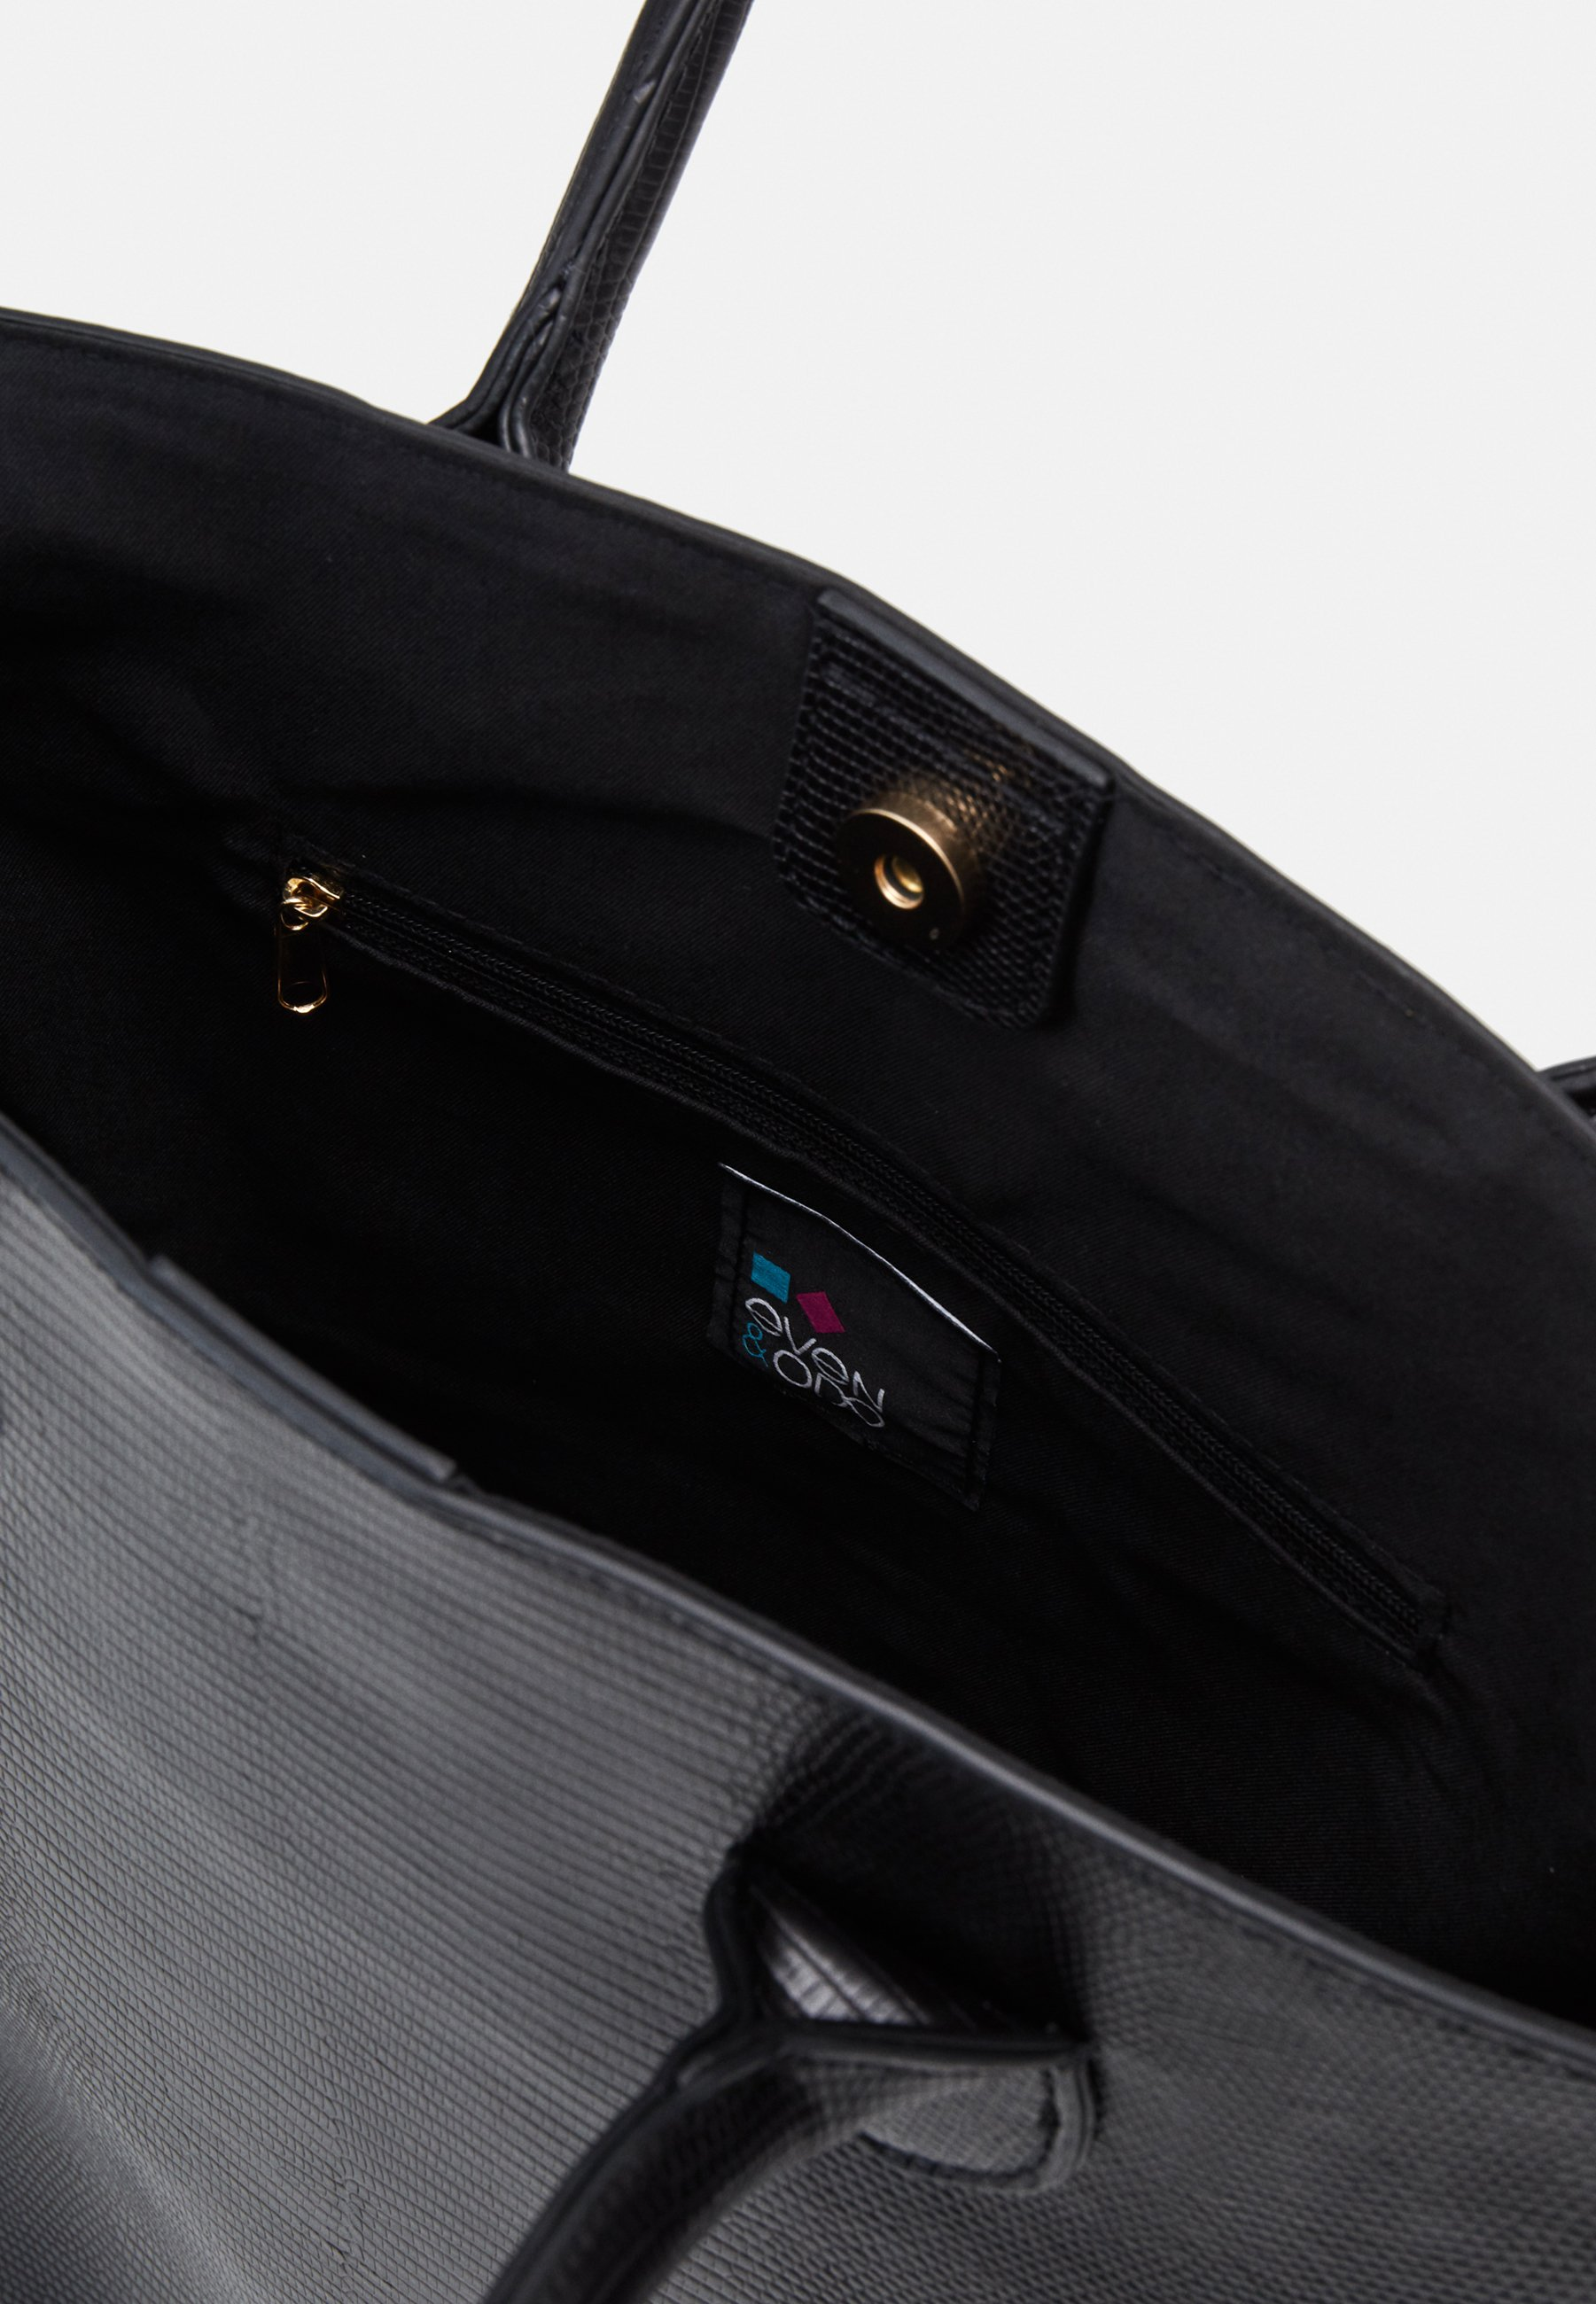 Even&Odd Shoppingveske - black/svart hioQ30YkEtqhR2i